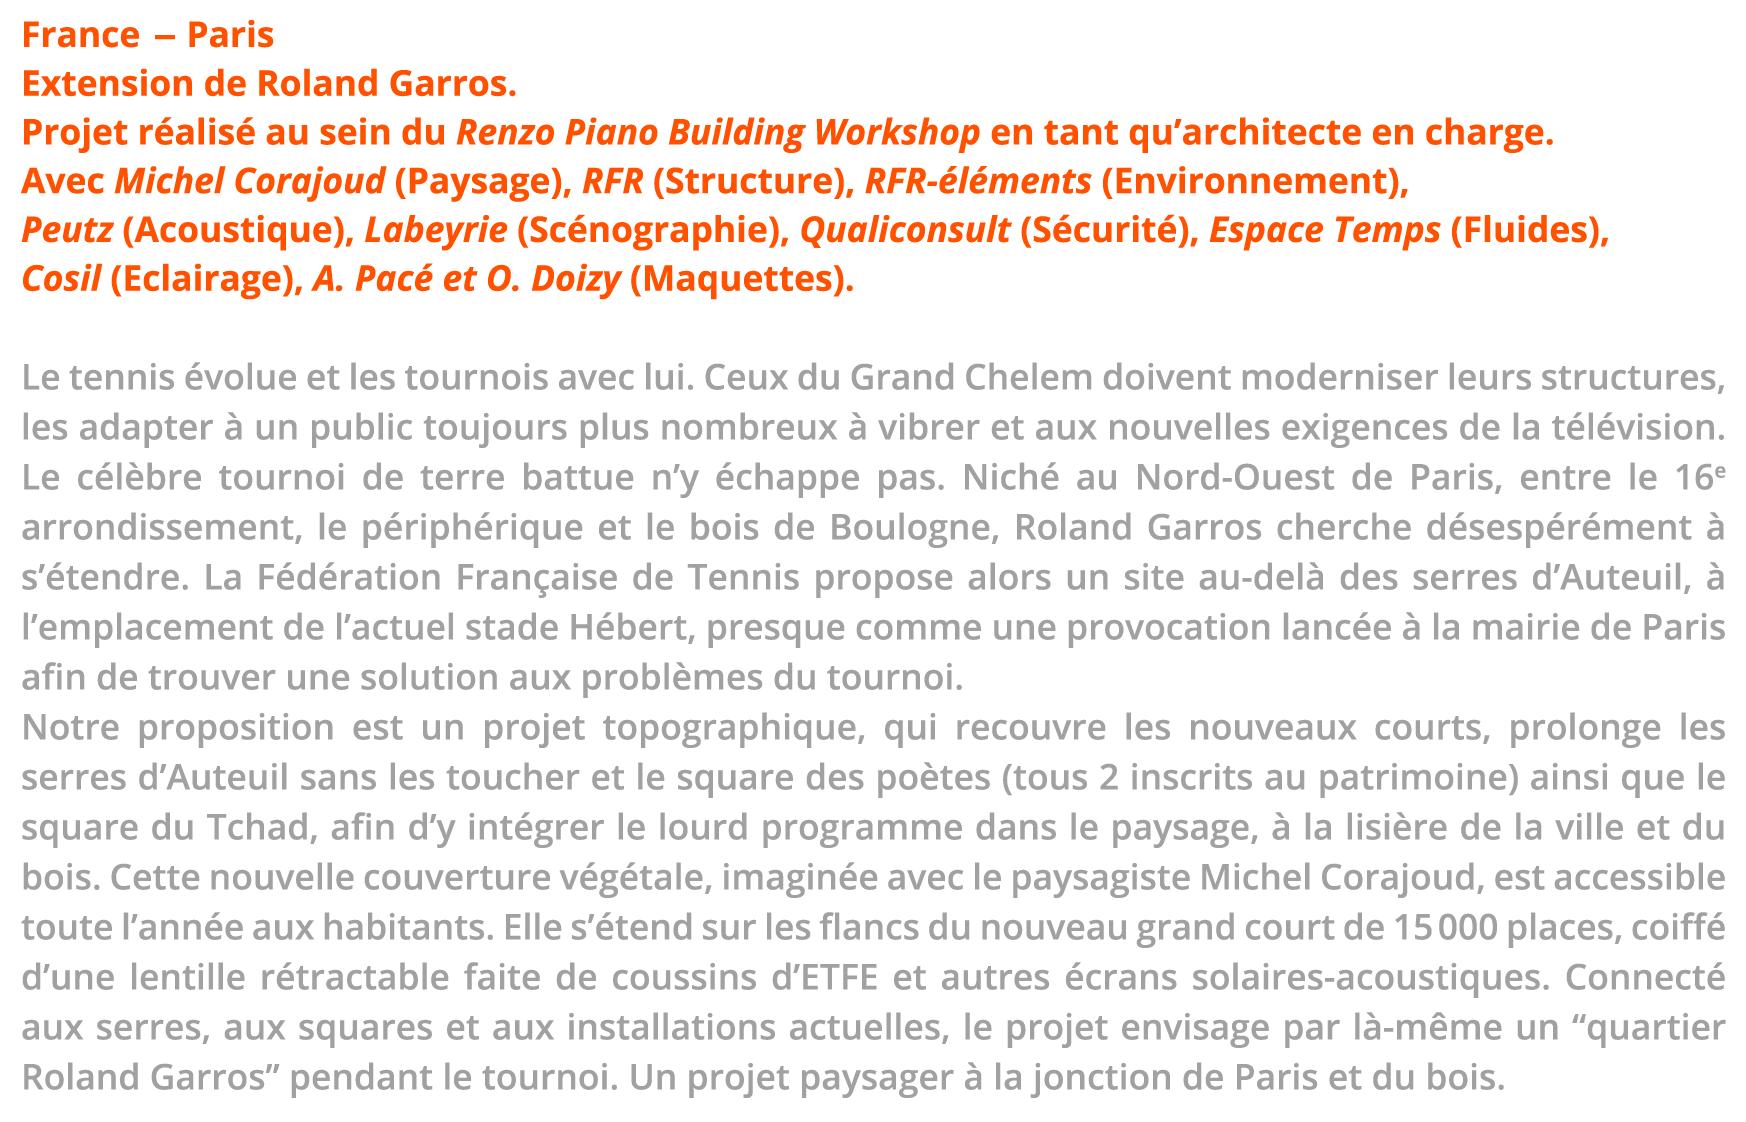 France-Roland-Garros-Texte.png